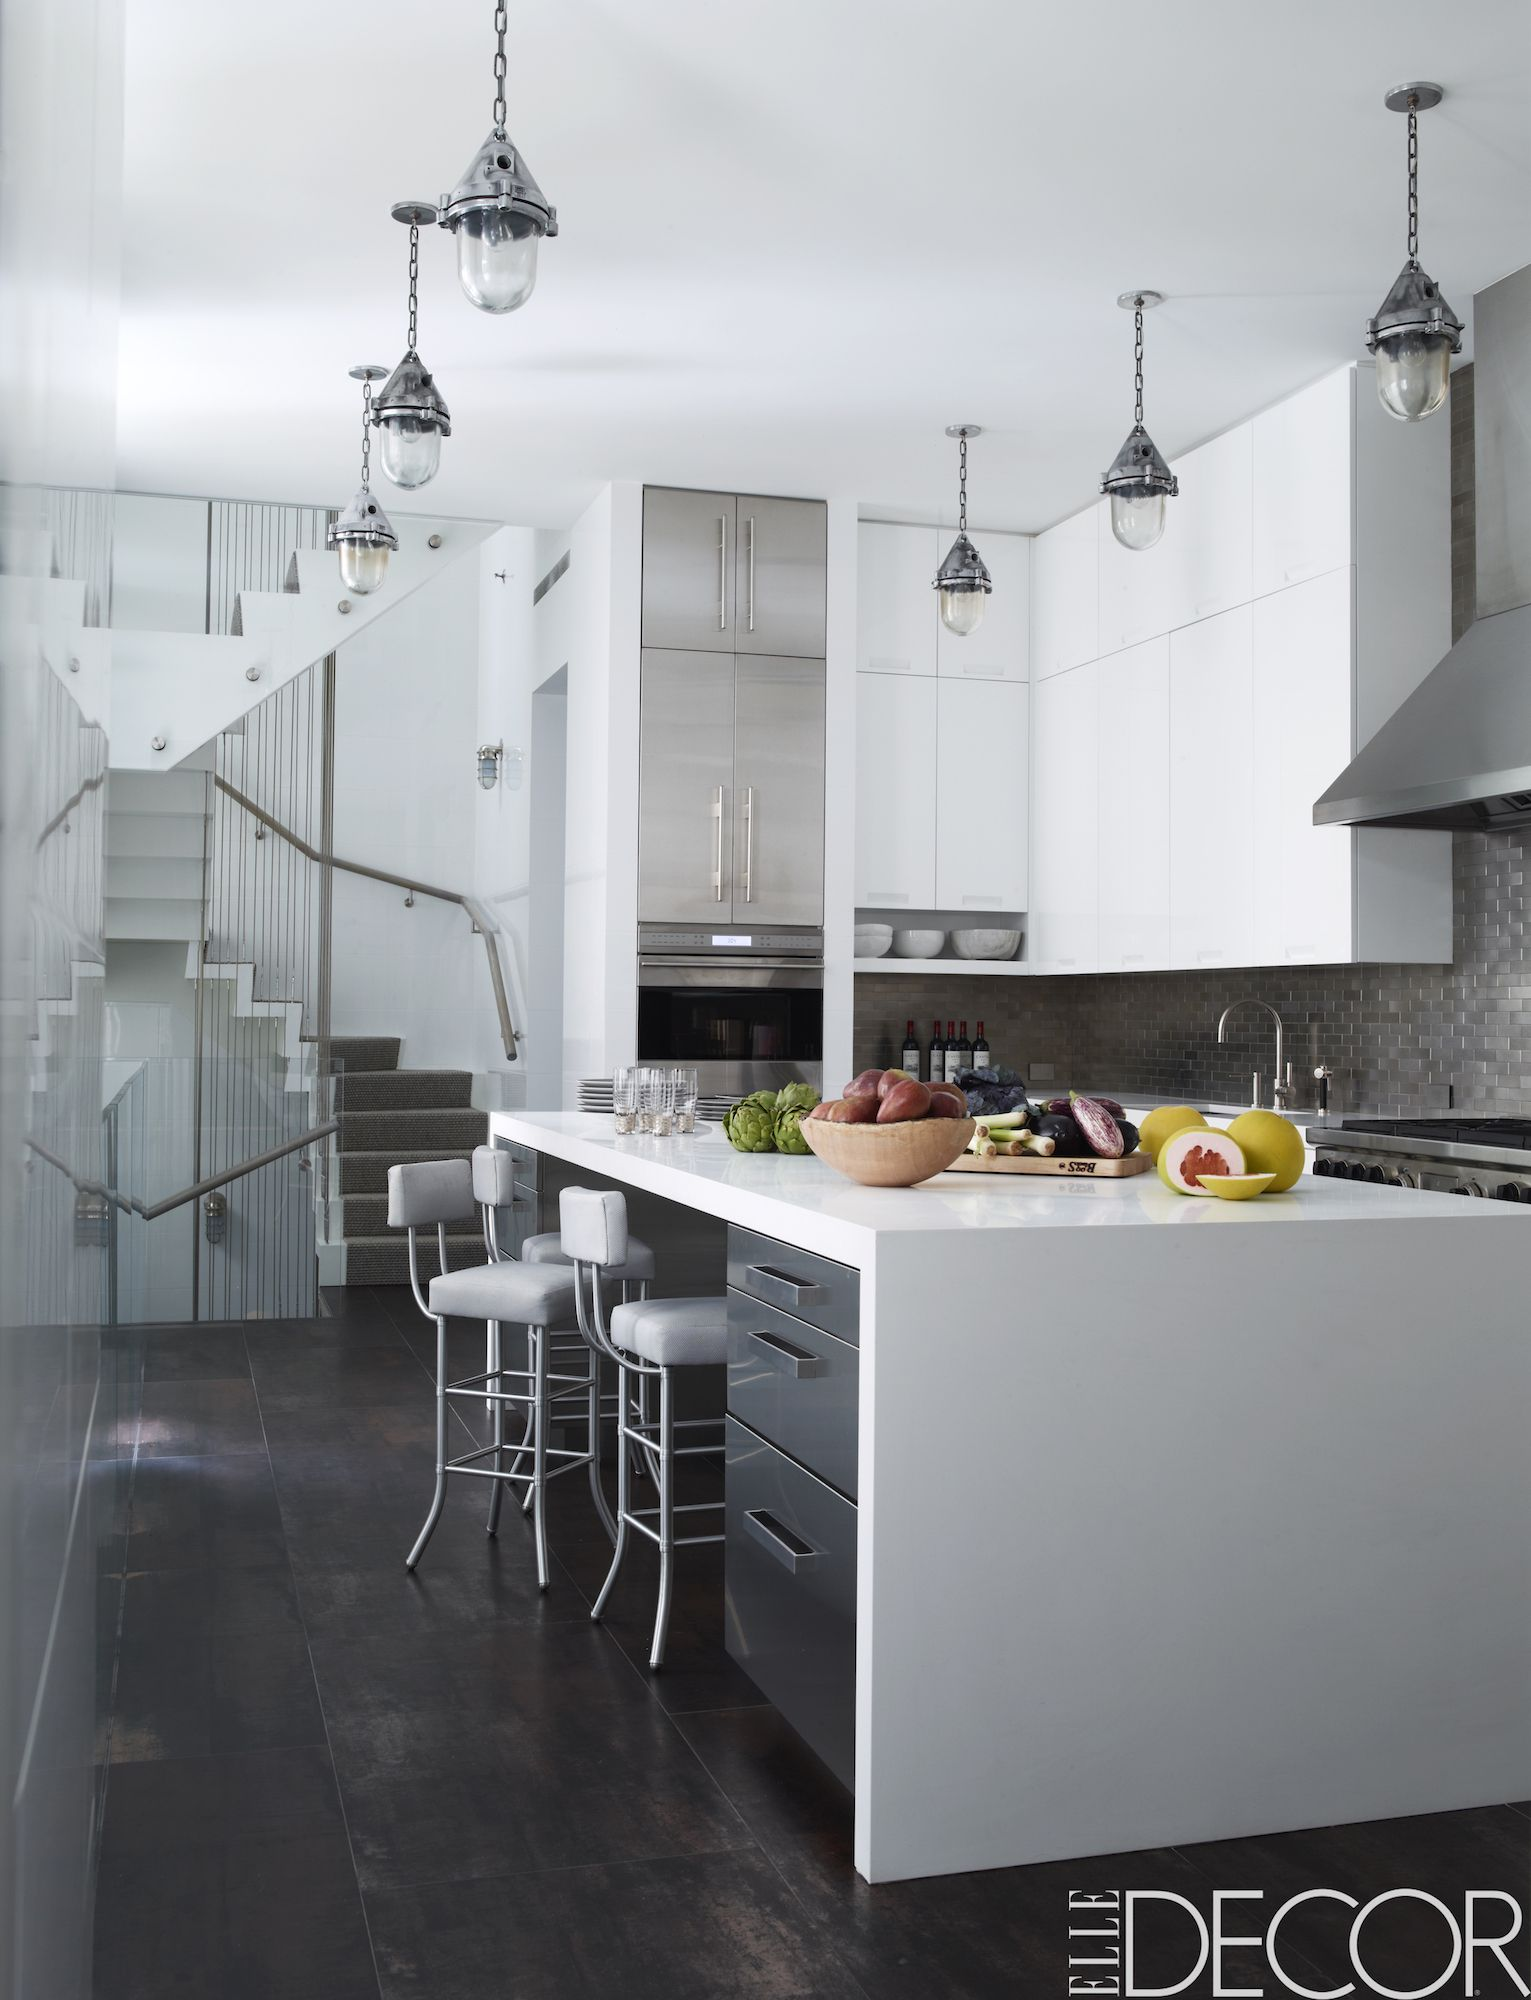 15 Best Kitchen Backsplash Tile Ideas - Kitchen Tiles